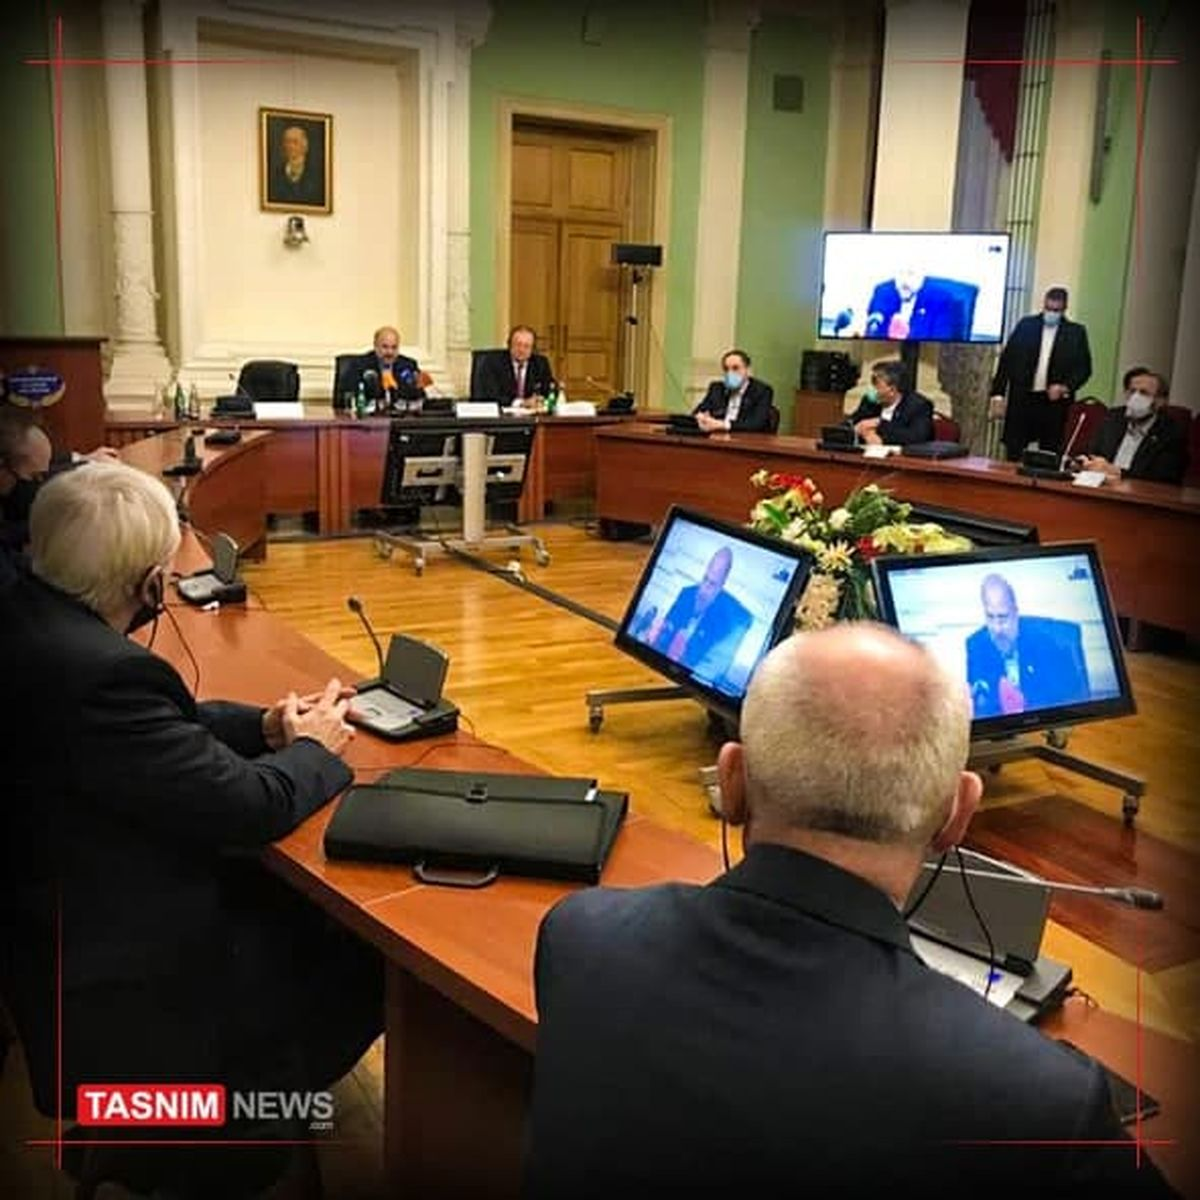 سخنرانی قالیباف در آکادمی دیپلماتیک روسیه +عکس